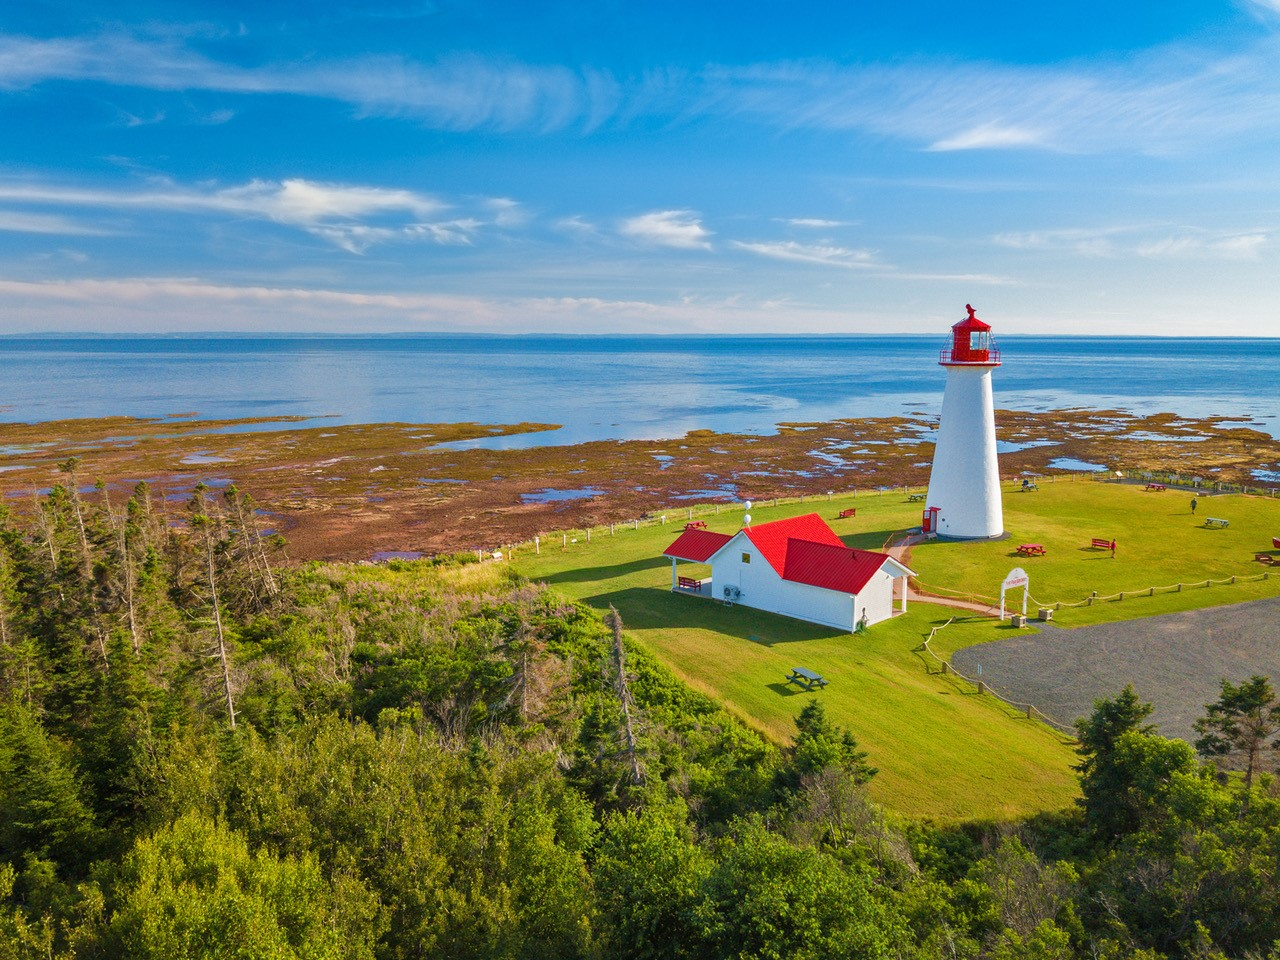 Lighthouse on a green expanse near the sea.